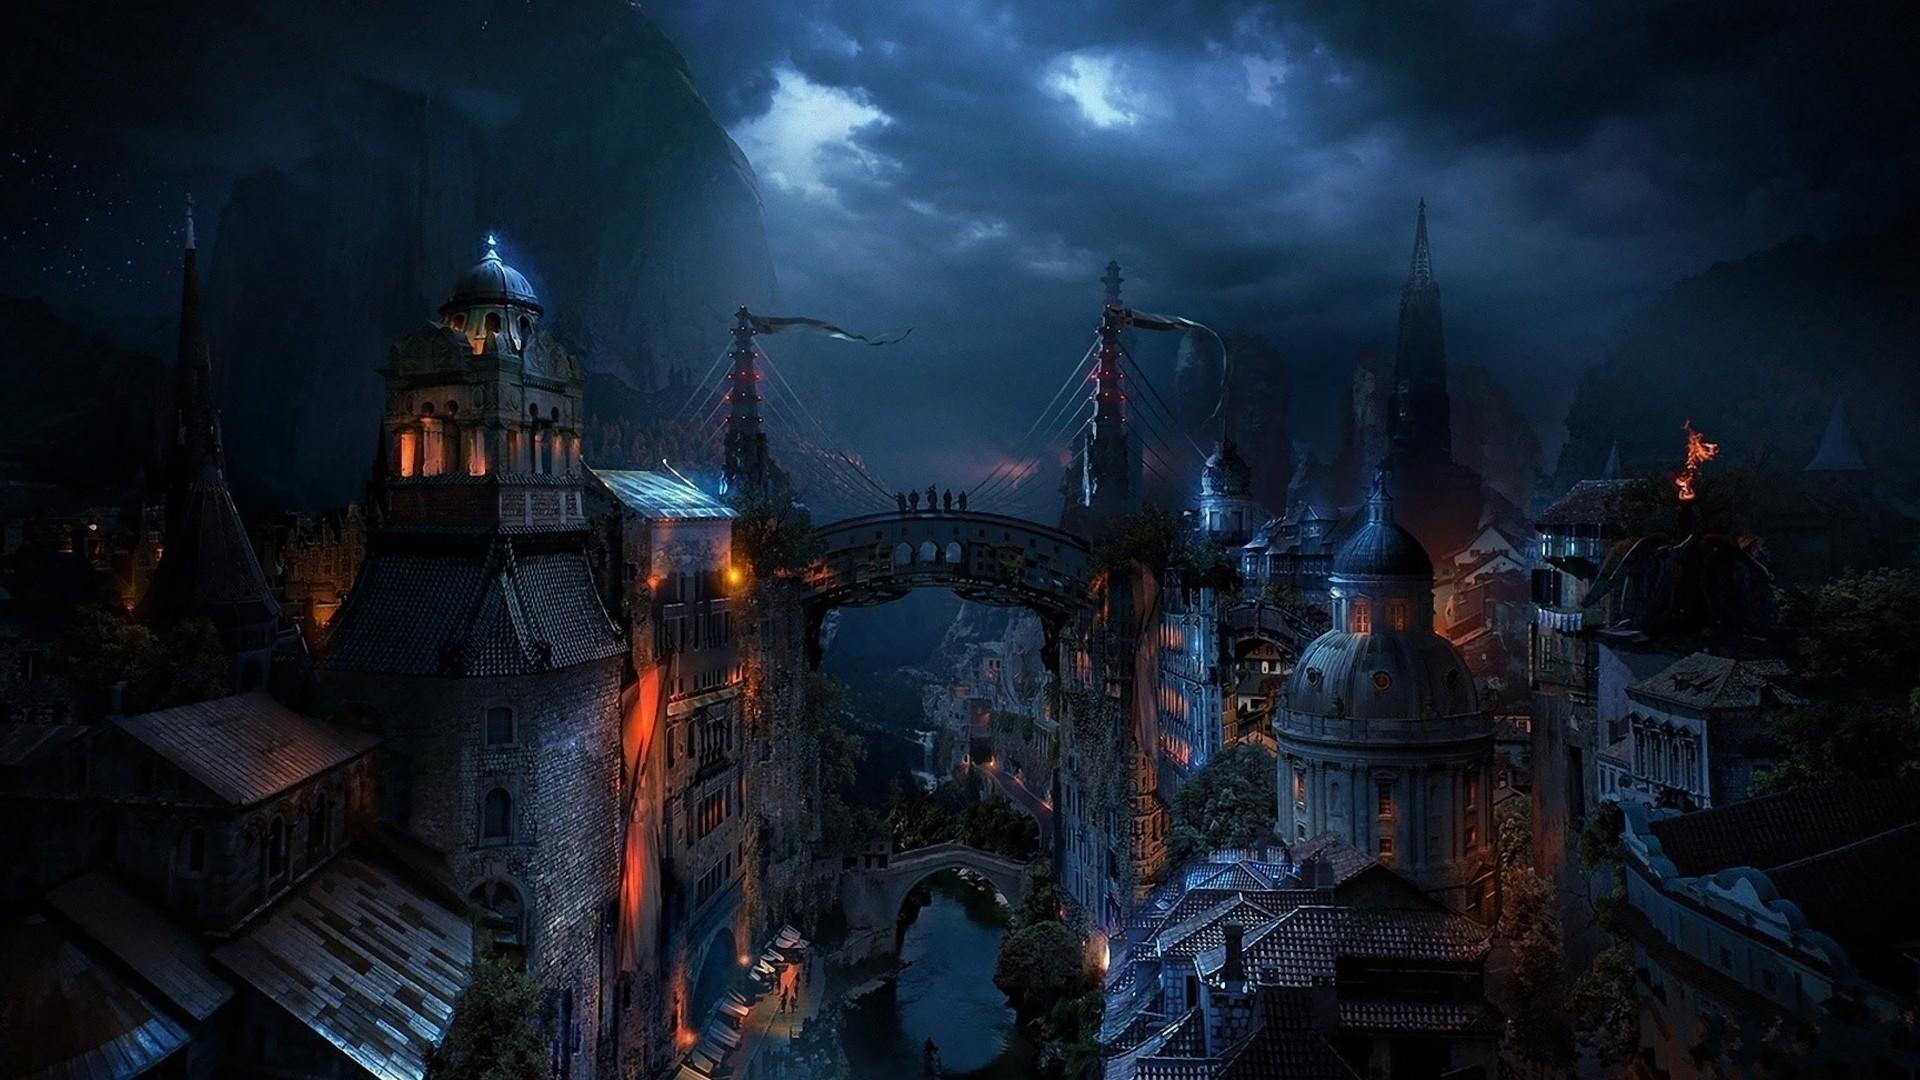 Image – Dark-medieval-city-fantasy-hd-wallpaper-1920×1080-2069.jpg    Constructed Worlds Wiki   FANDOM powered by Wikia